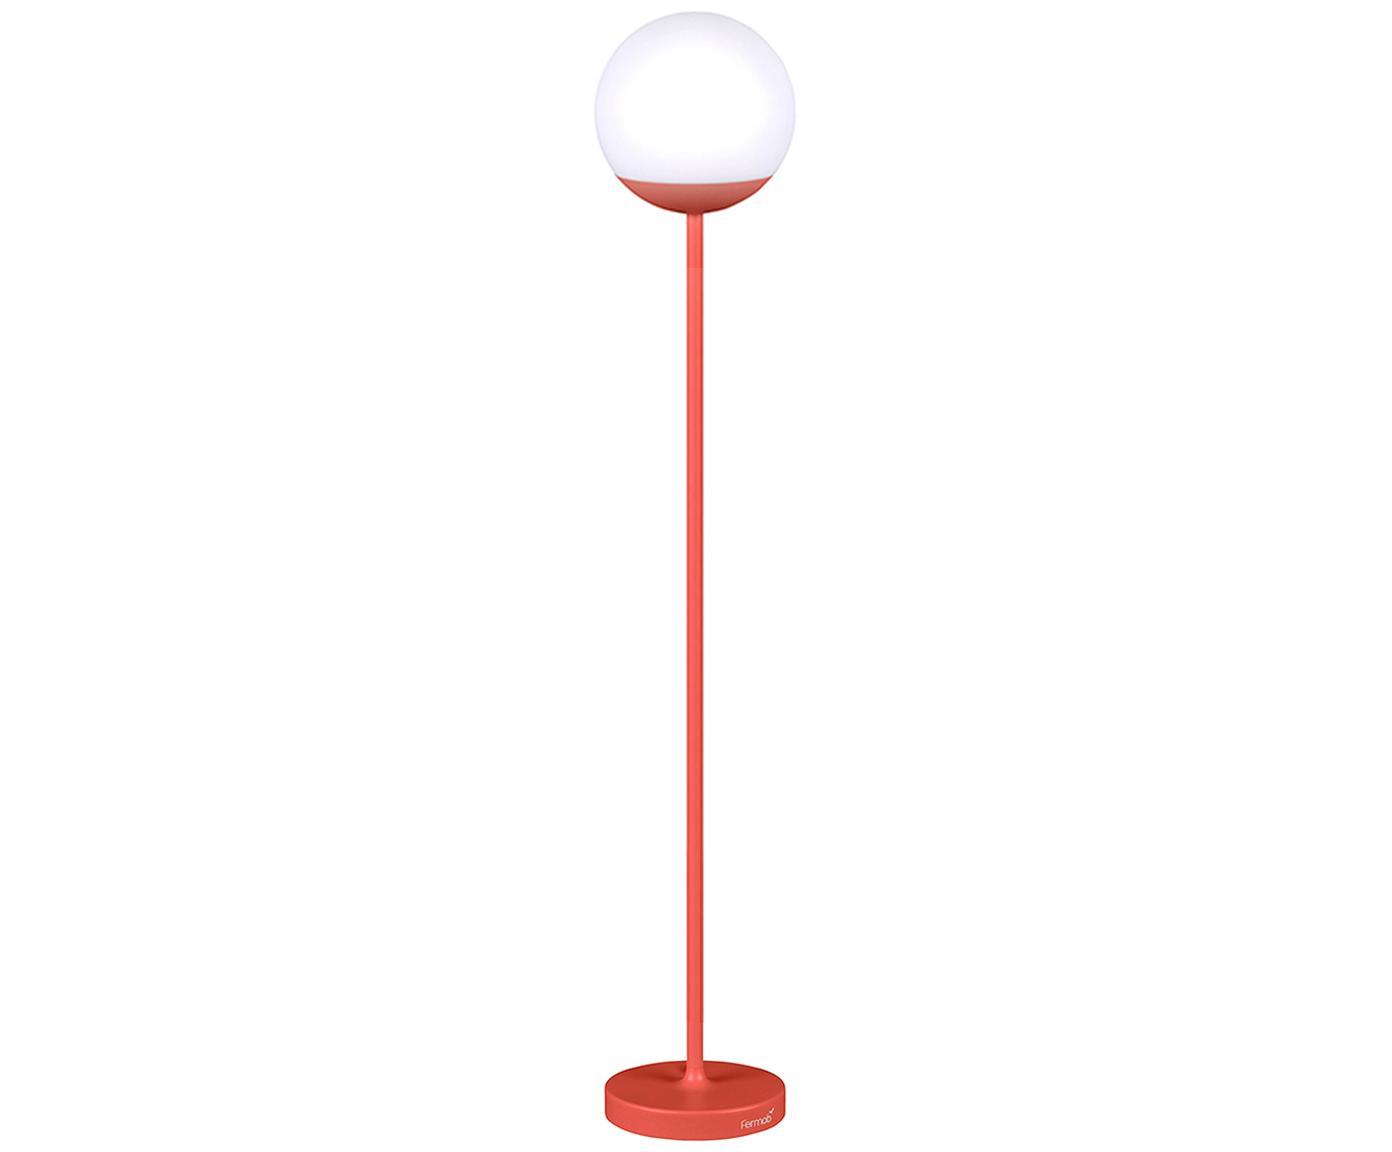 Lampada portatile da esterno a LED Mooon, Paralume: materiale sintetico, Rosso, Ø 25 x Alt. 134 cm